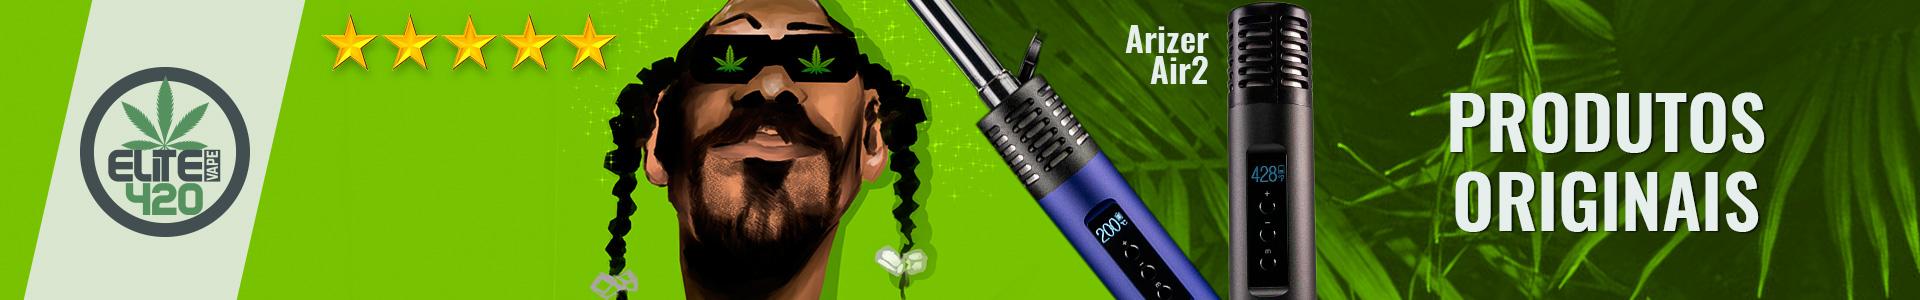 Campanha Weed Week 420 - ad02